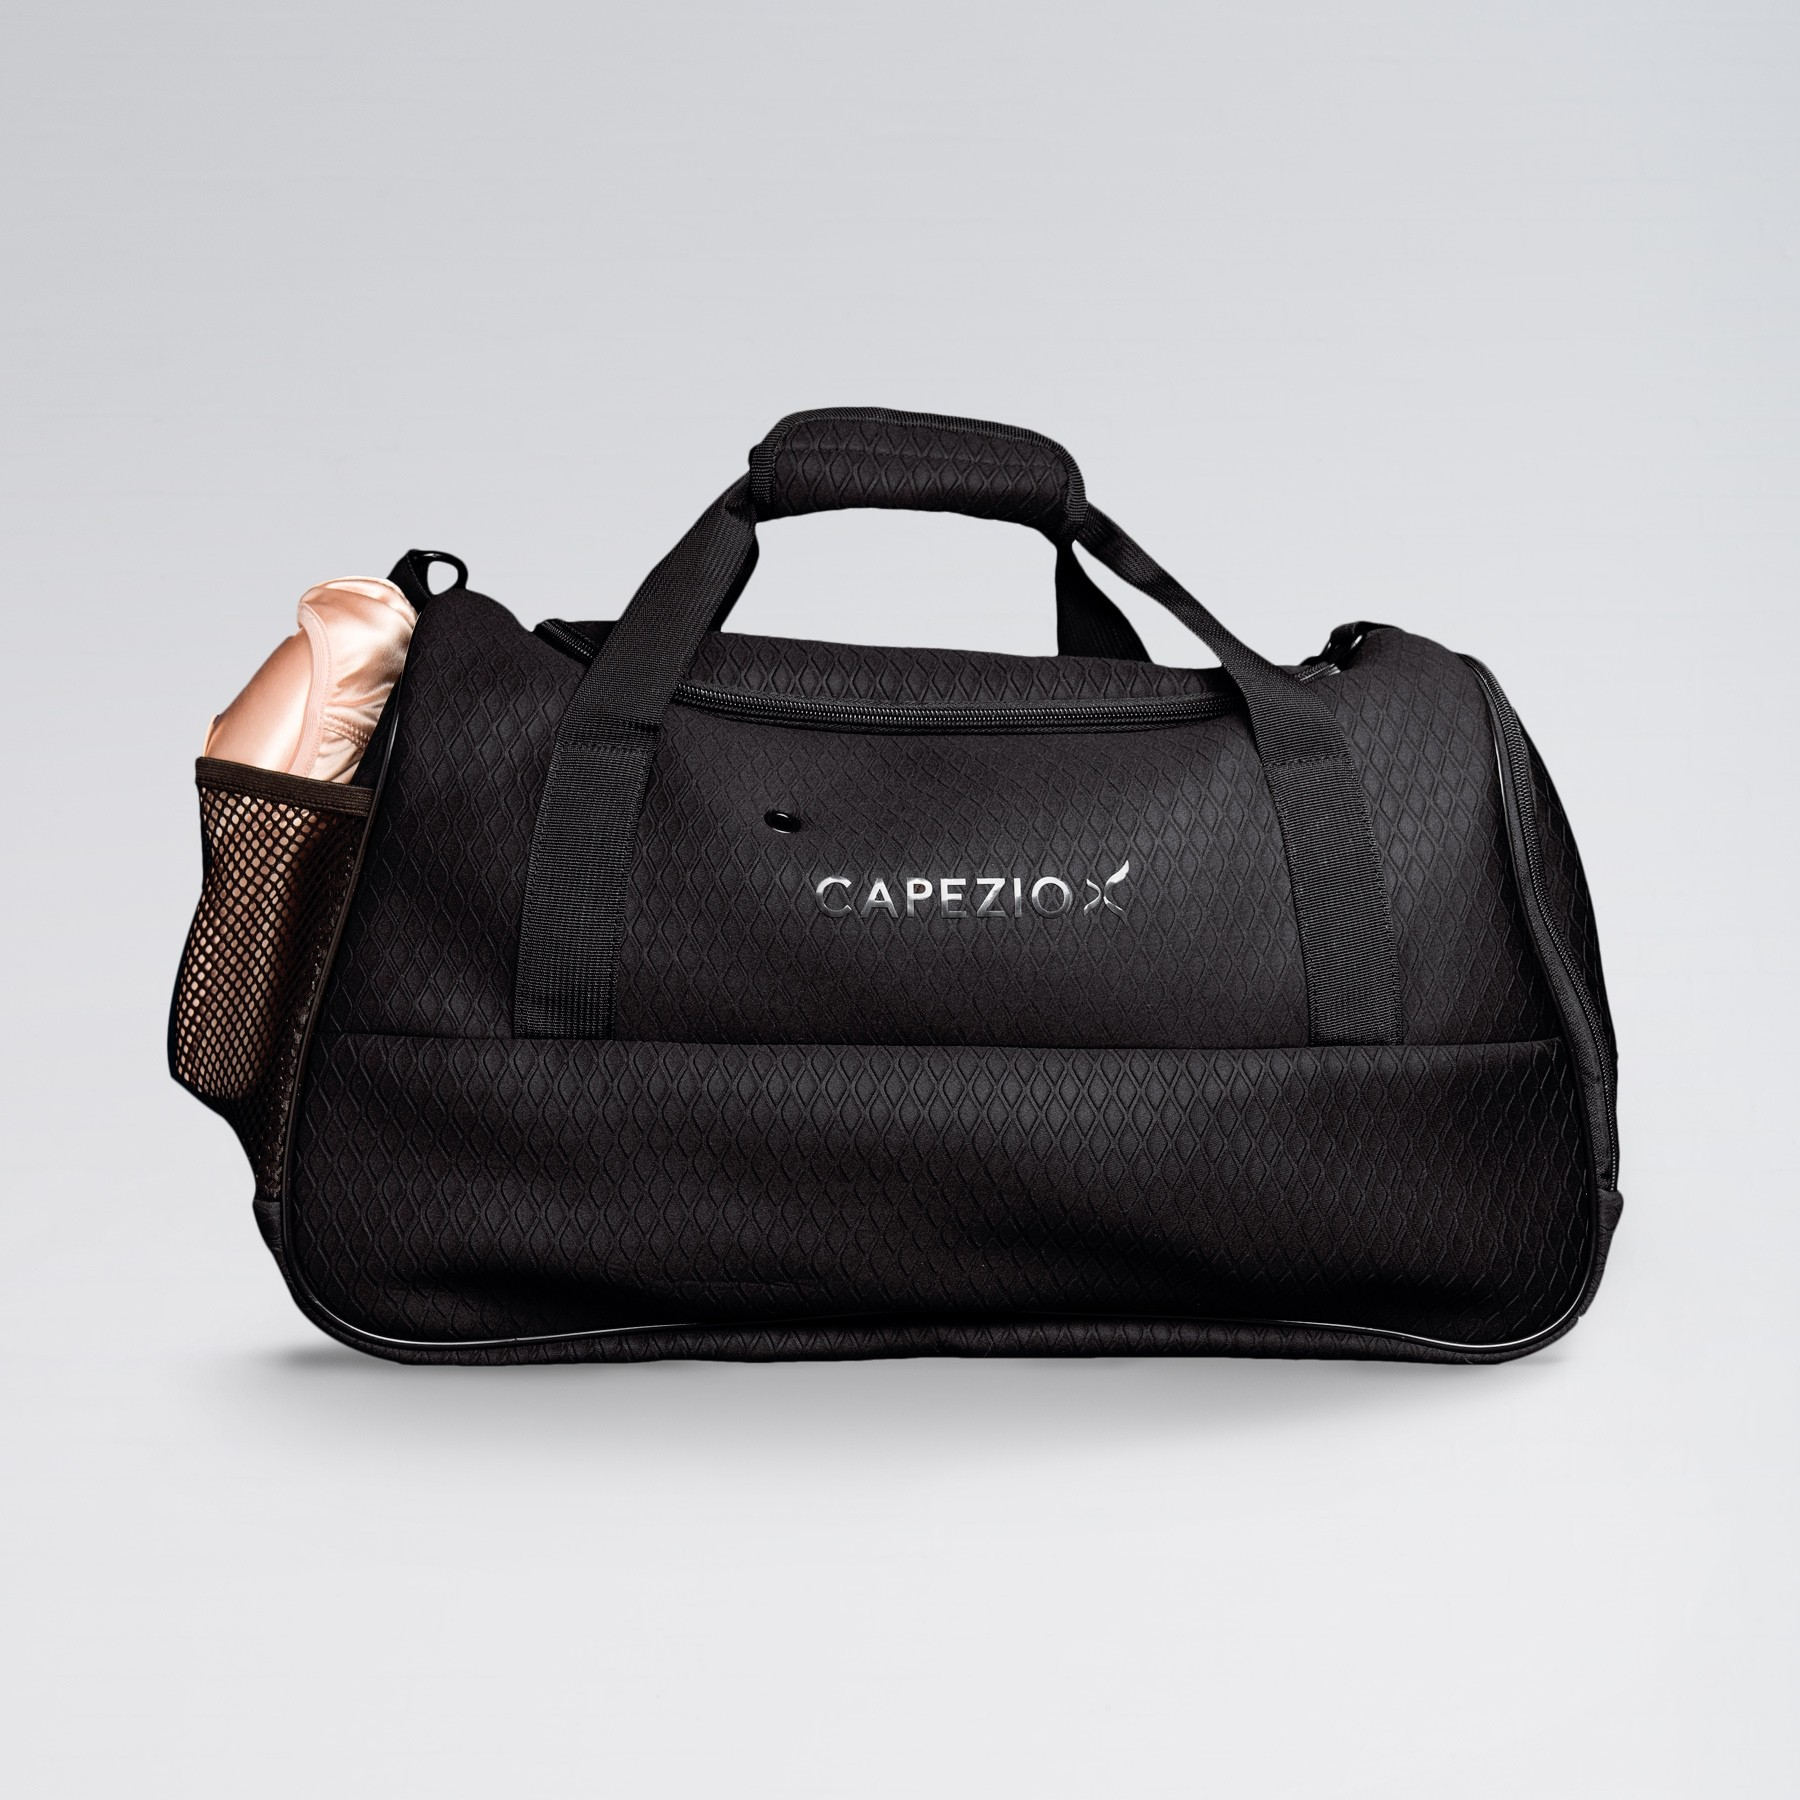 Capezio Rock Star Duffle Bag